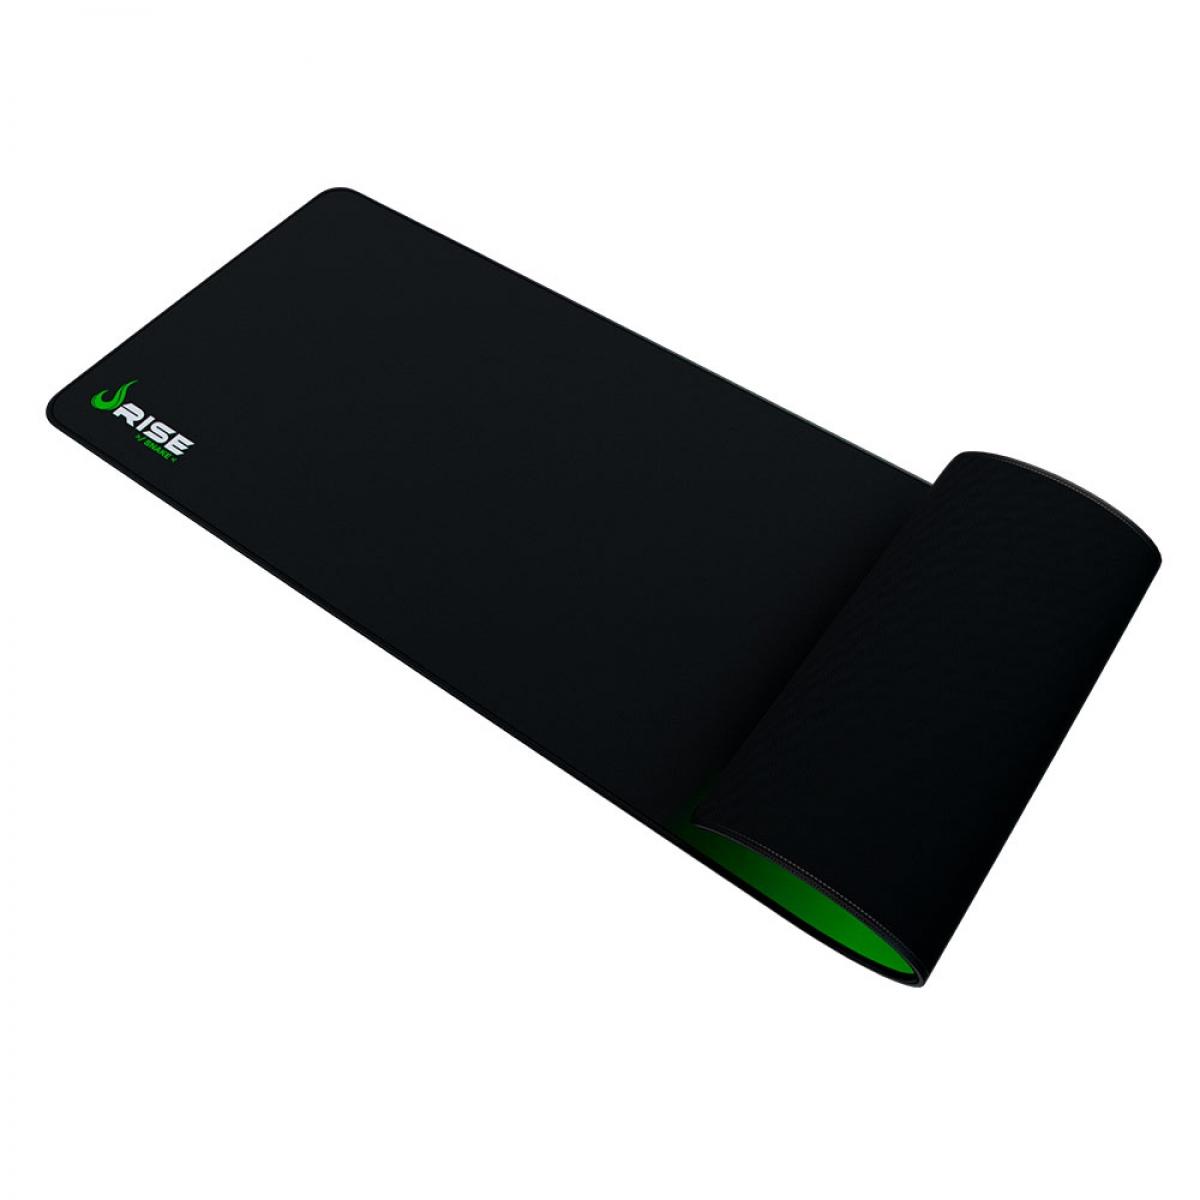 Mouse Pad Gamer Rise Mode SNAKE EXTENDED BORDA COSTURADA RG-MP-06-SE